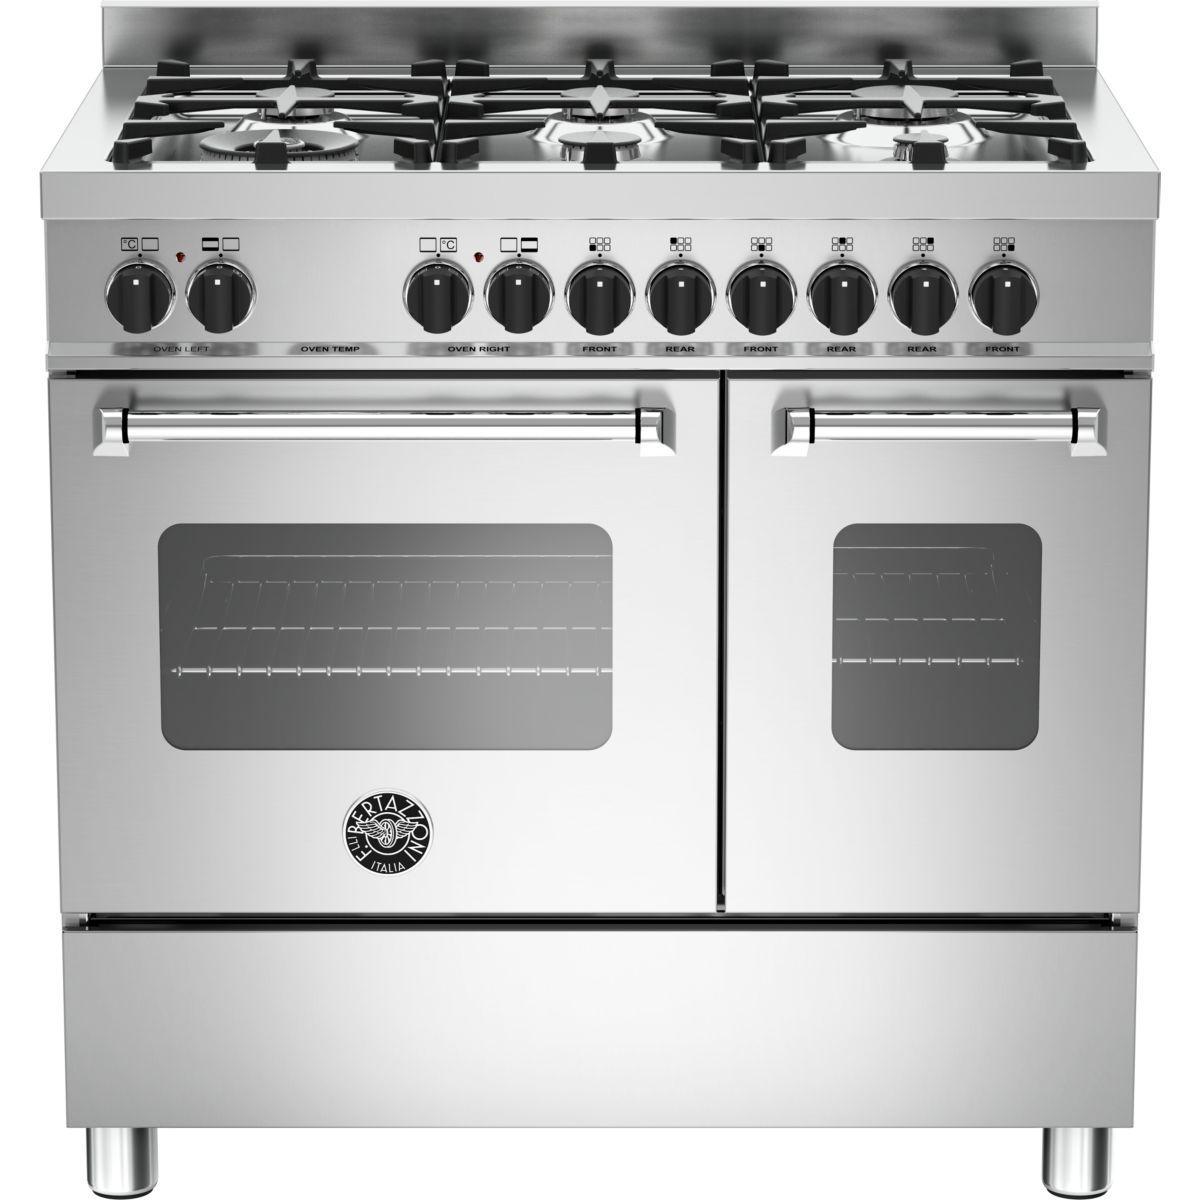 Piano de cuisson bertazzoni mas90 6 mfe d xe - produit coup de coeur webdistrib.com ! (photo)